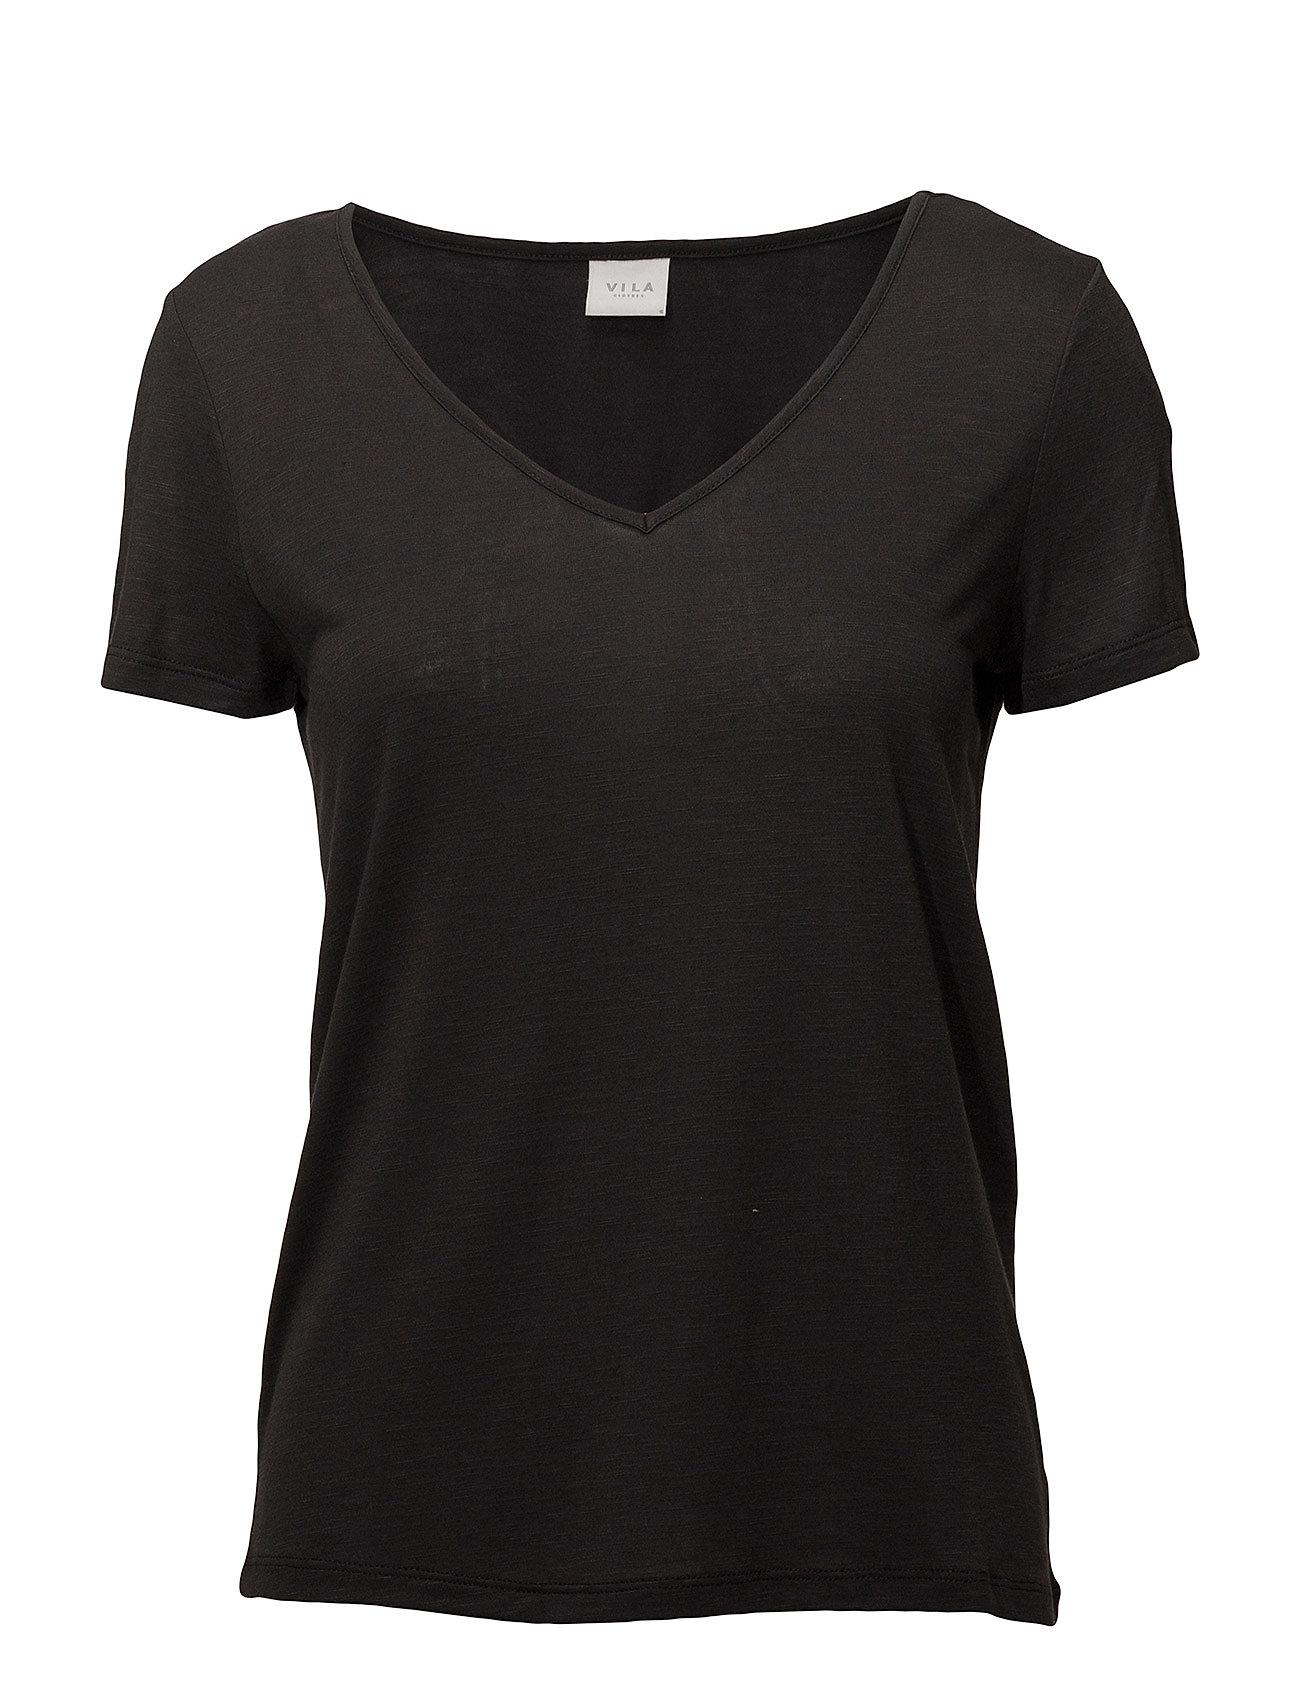 s Vinoel T S V noosblackVila neck shirt 3q4Lcj5RA